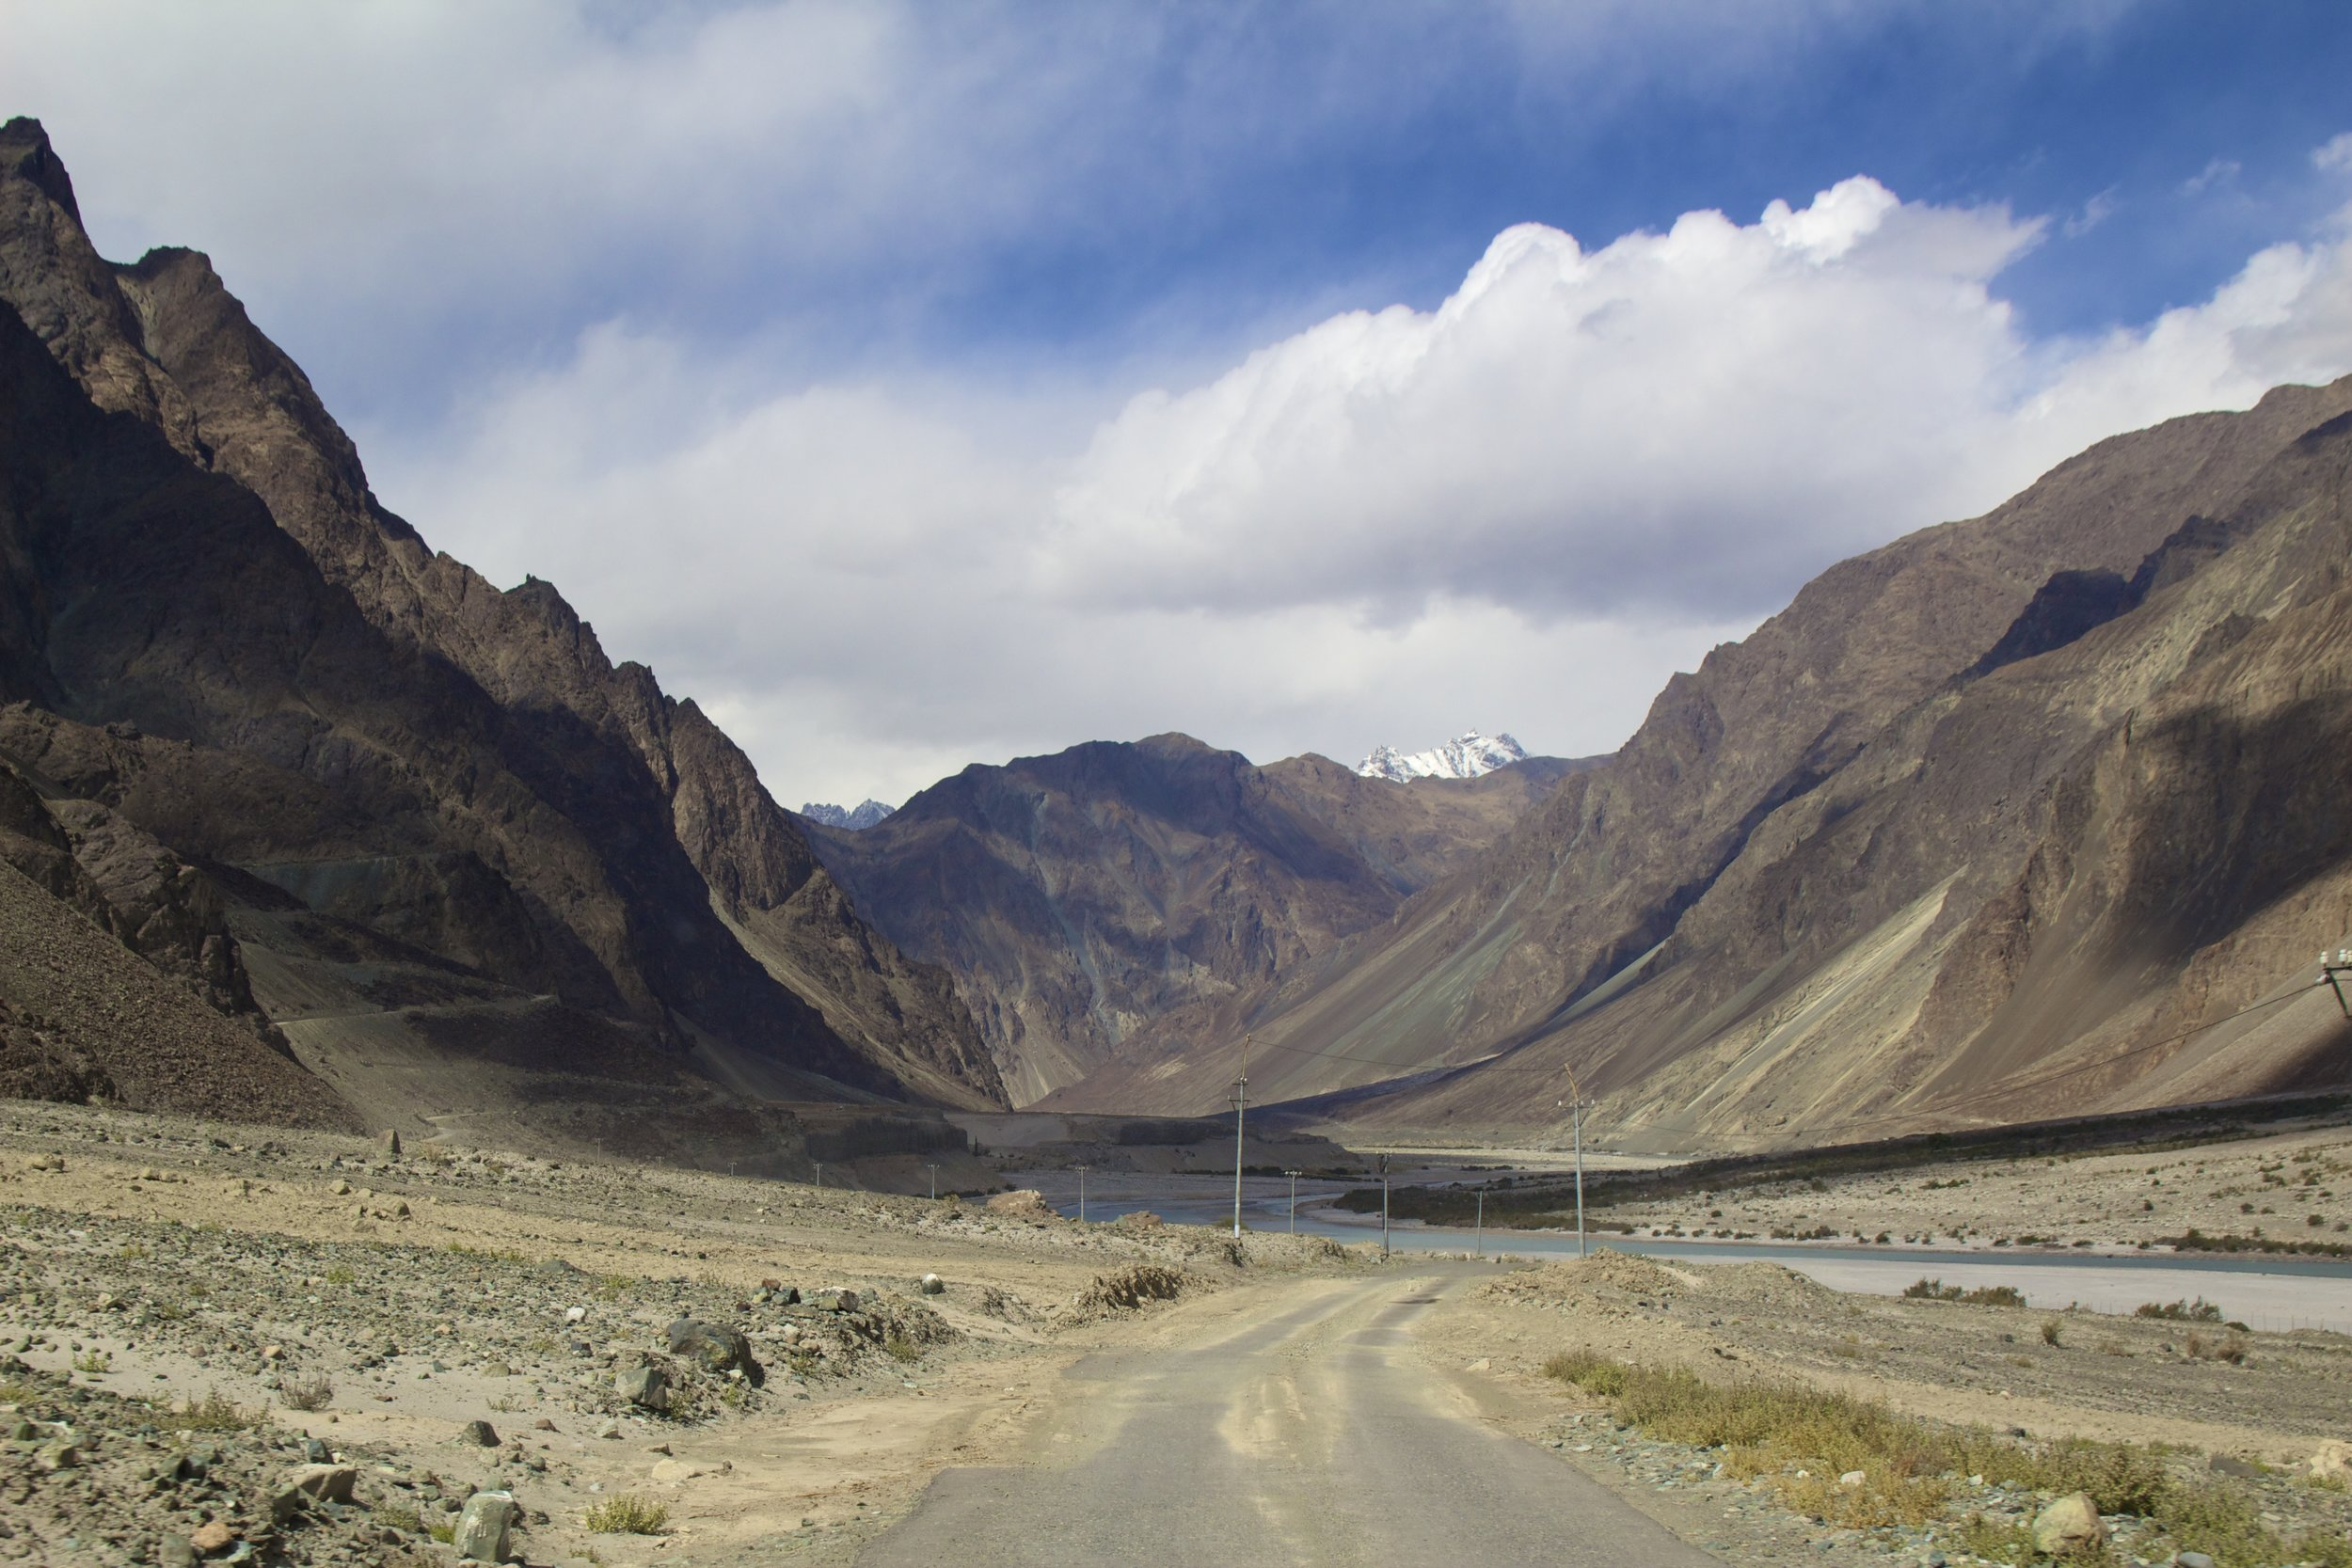 Nubra Valley Ladakh Kashmir Indian Himalayas Roads 13.jpg